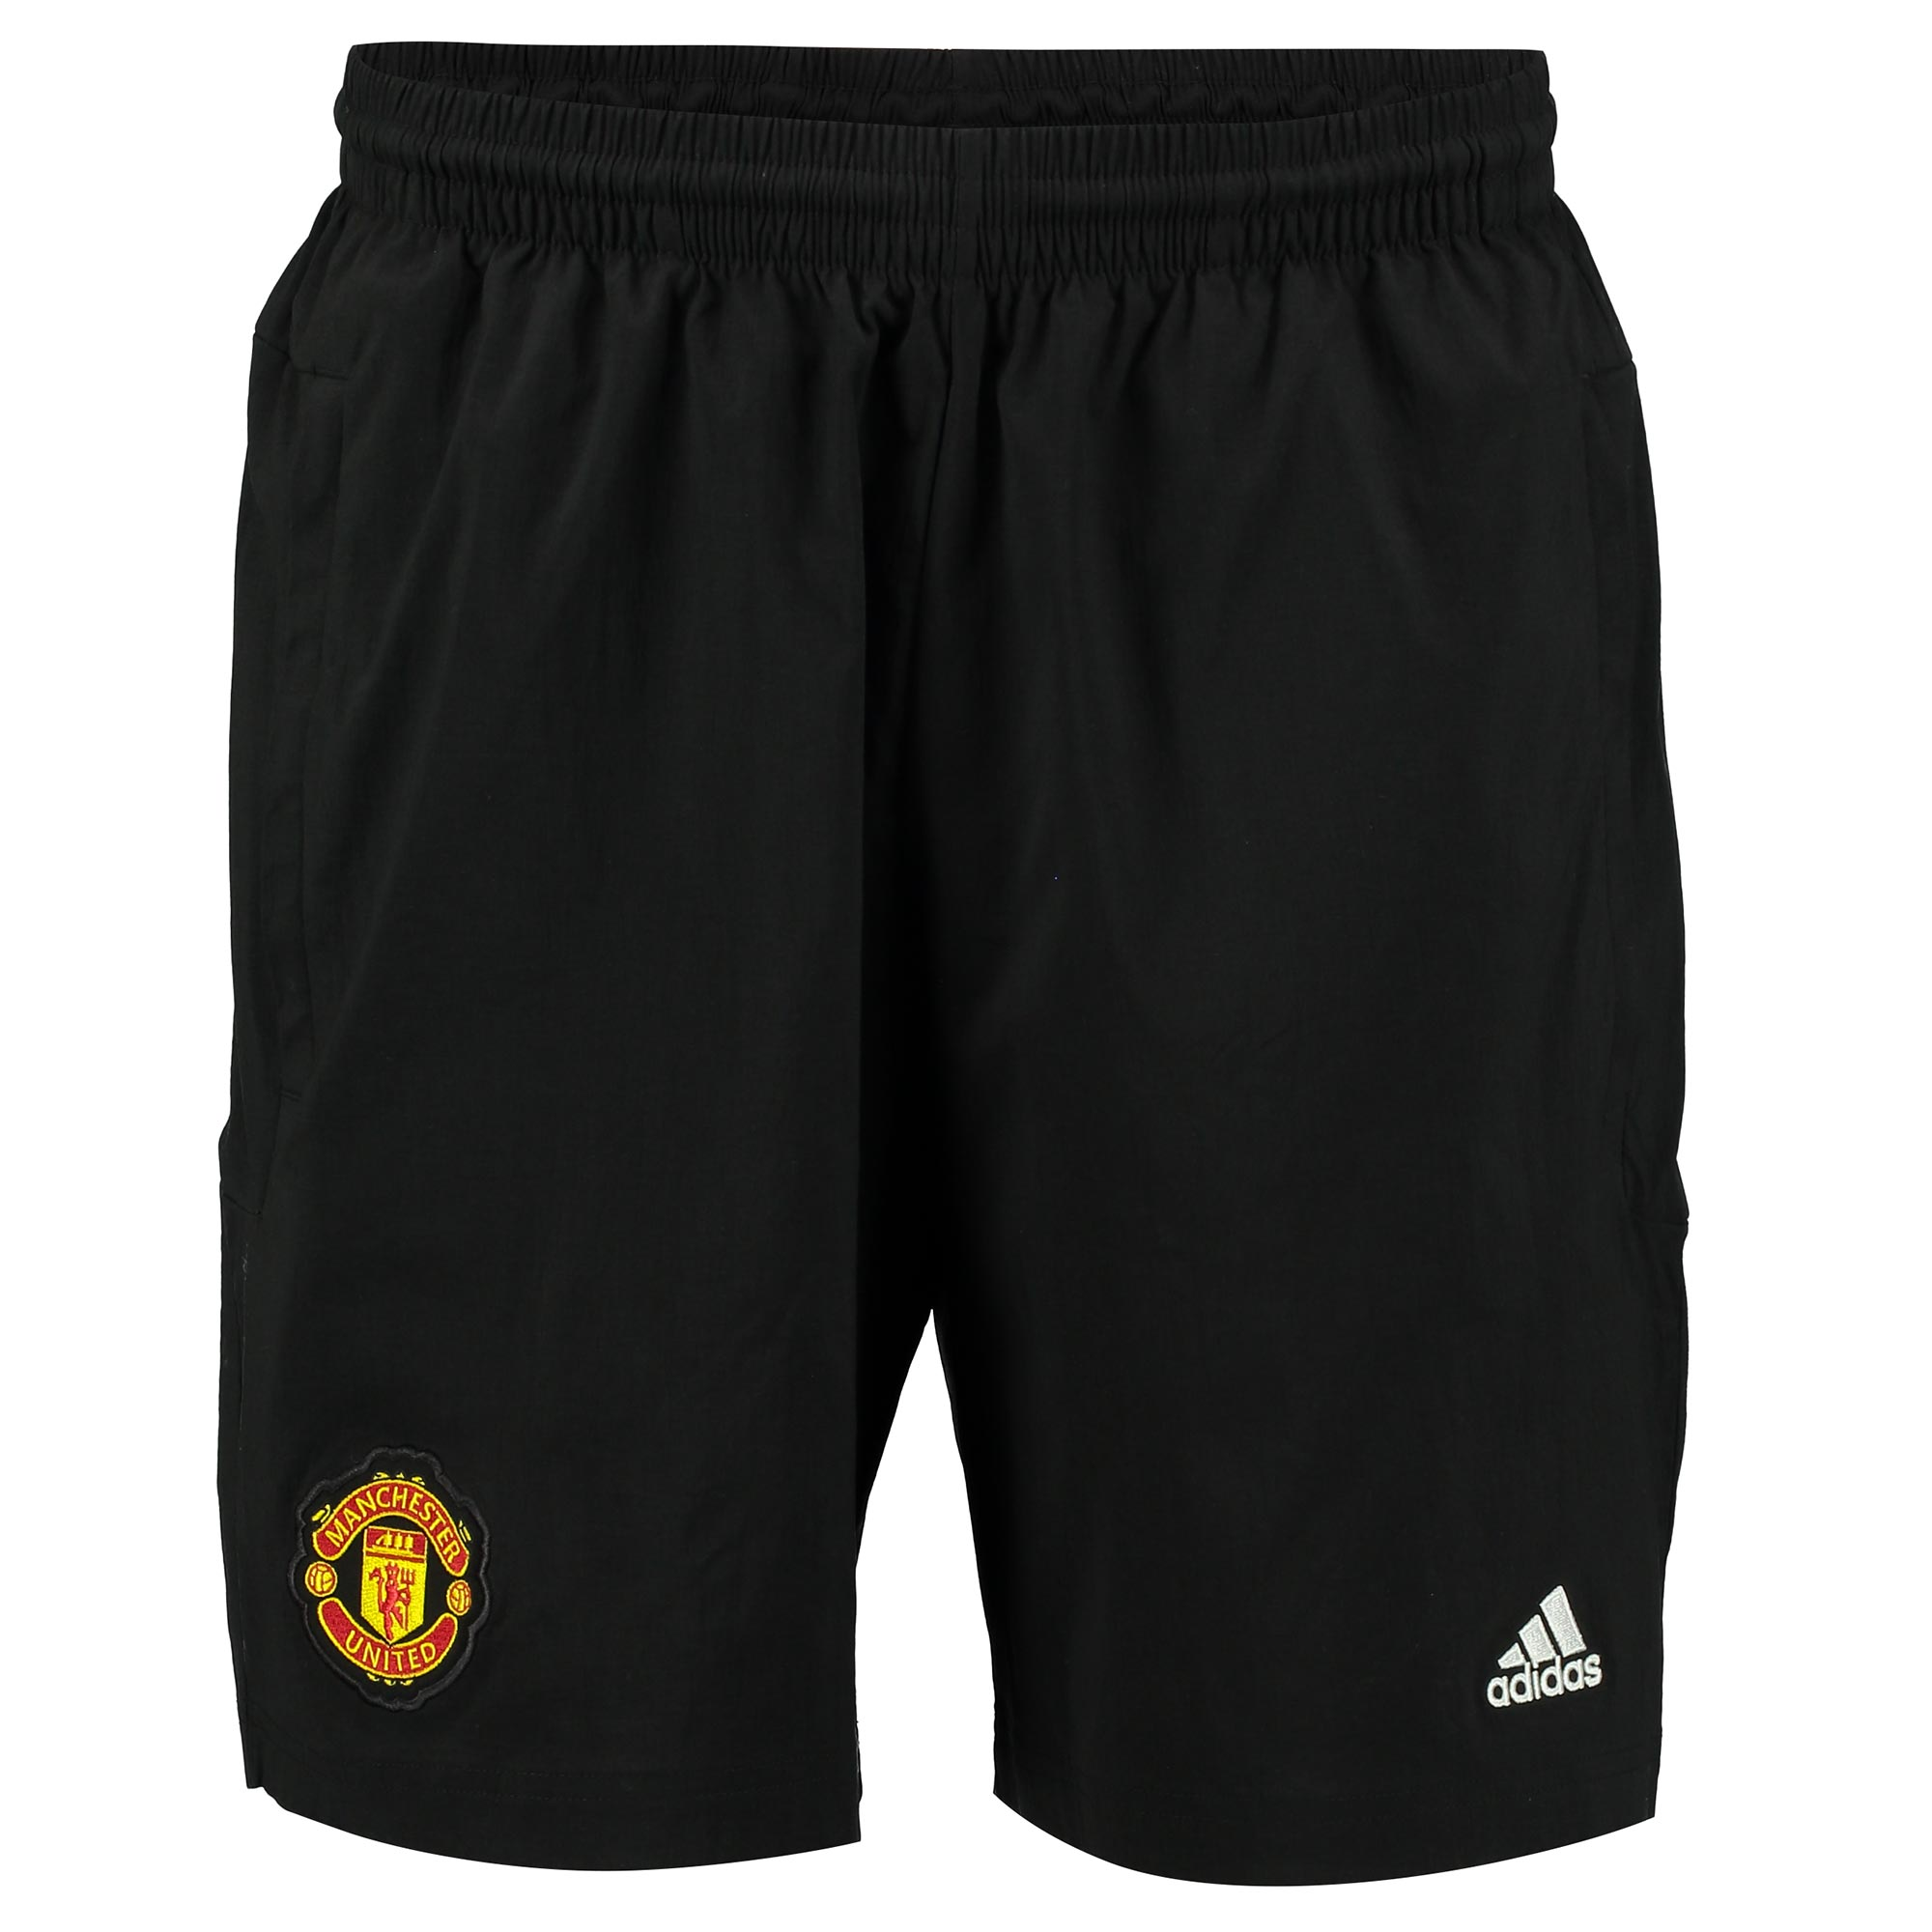 Manchester United Woven Short - Black